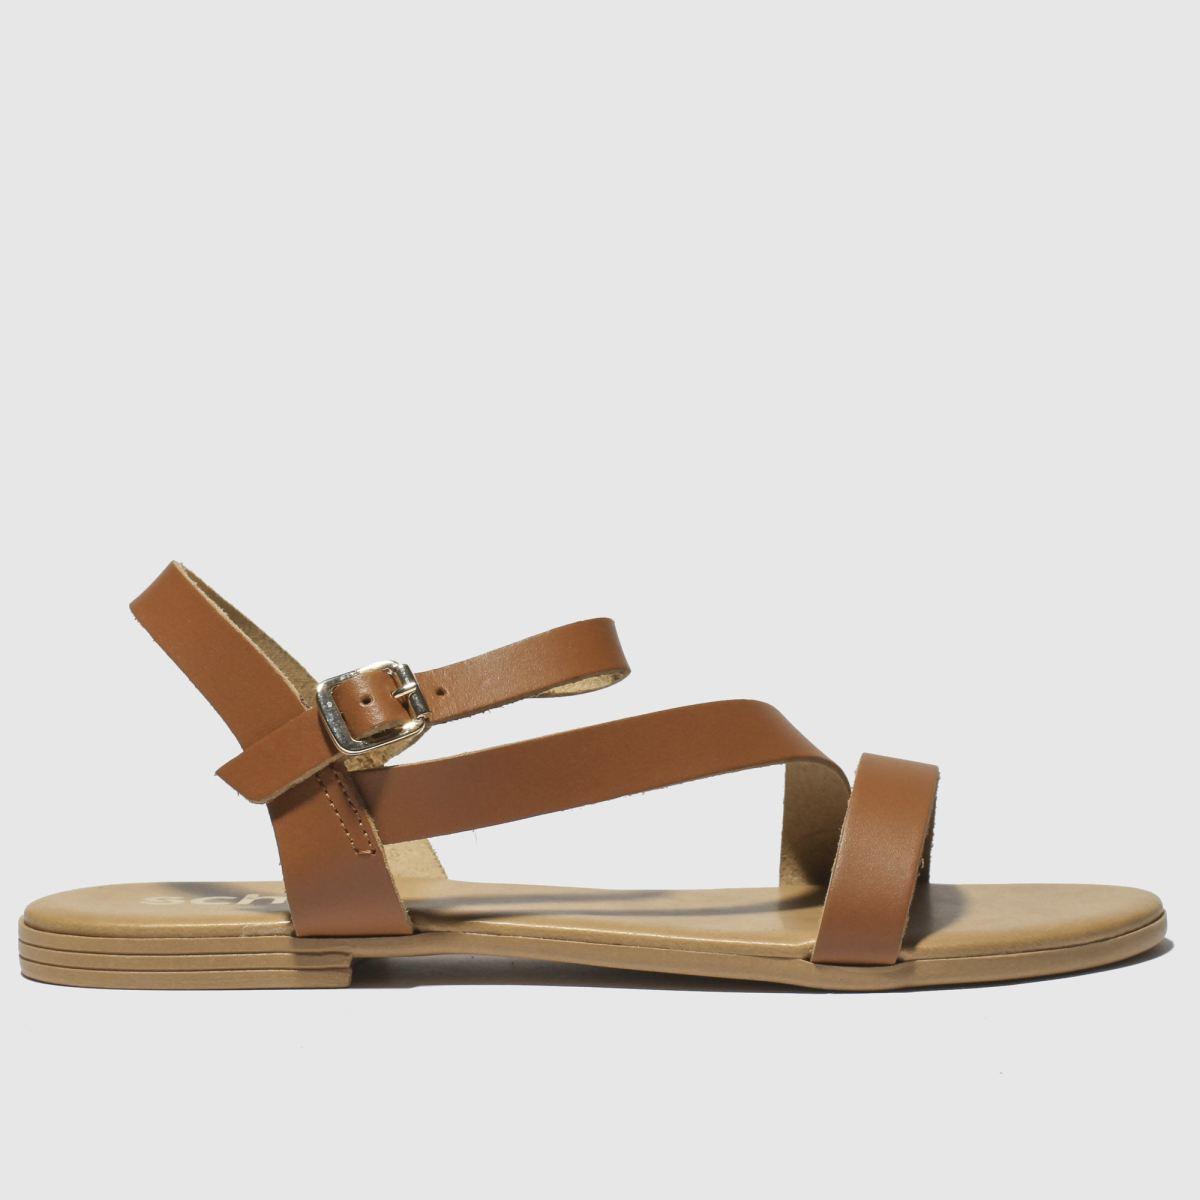 schuh Schuh Tan Sicily Sandals